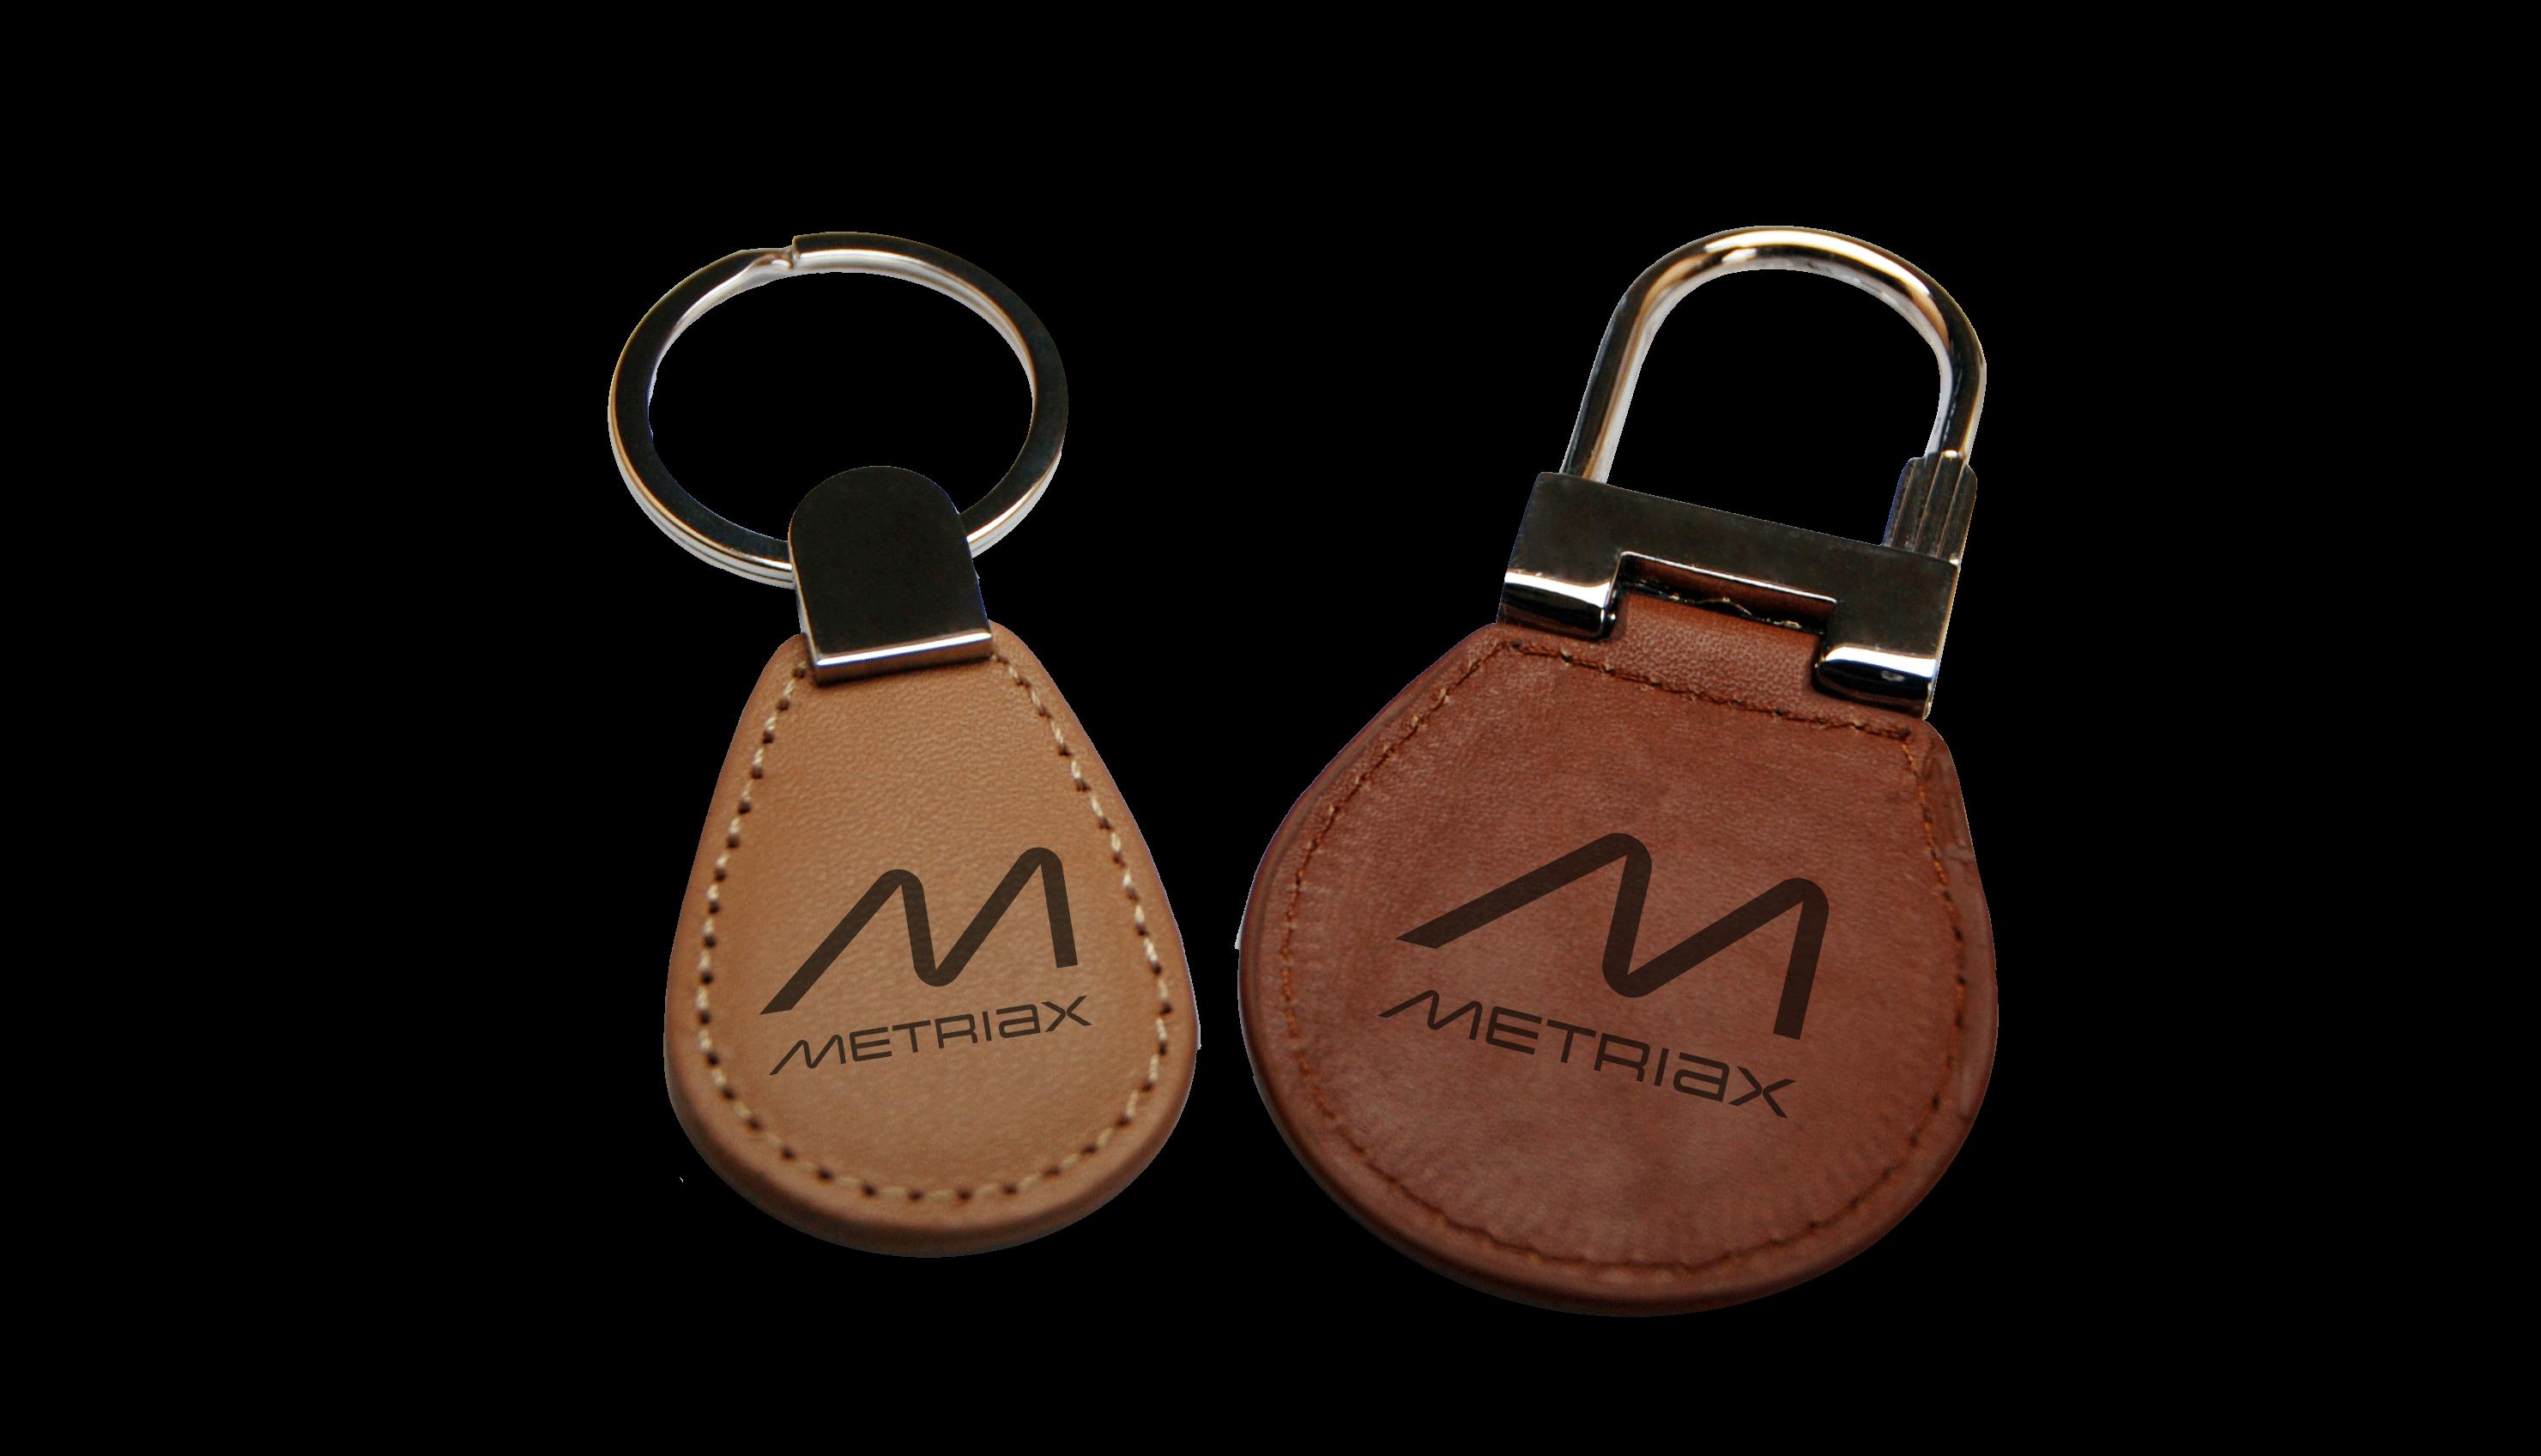 Metriax-Leder-RFID-NFC-Keyfobs-Schlüsselanhänger-handgenäht-Wallbox-Ladesäule